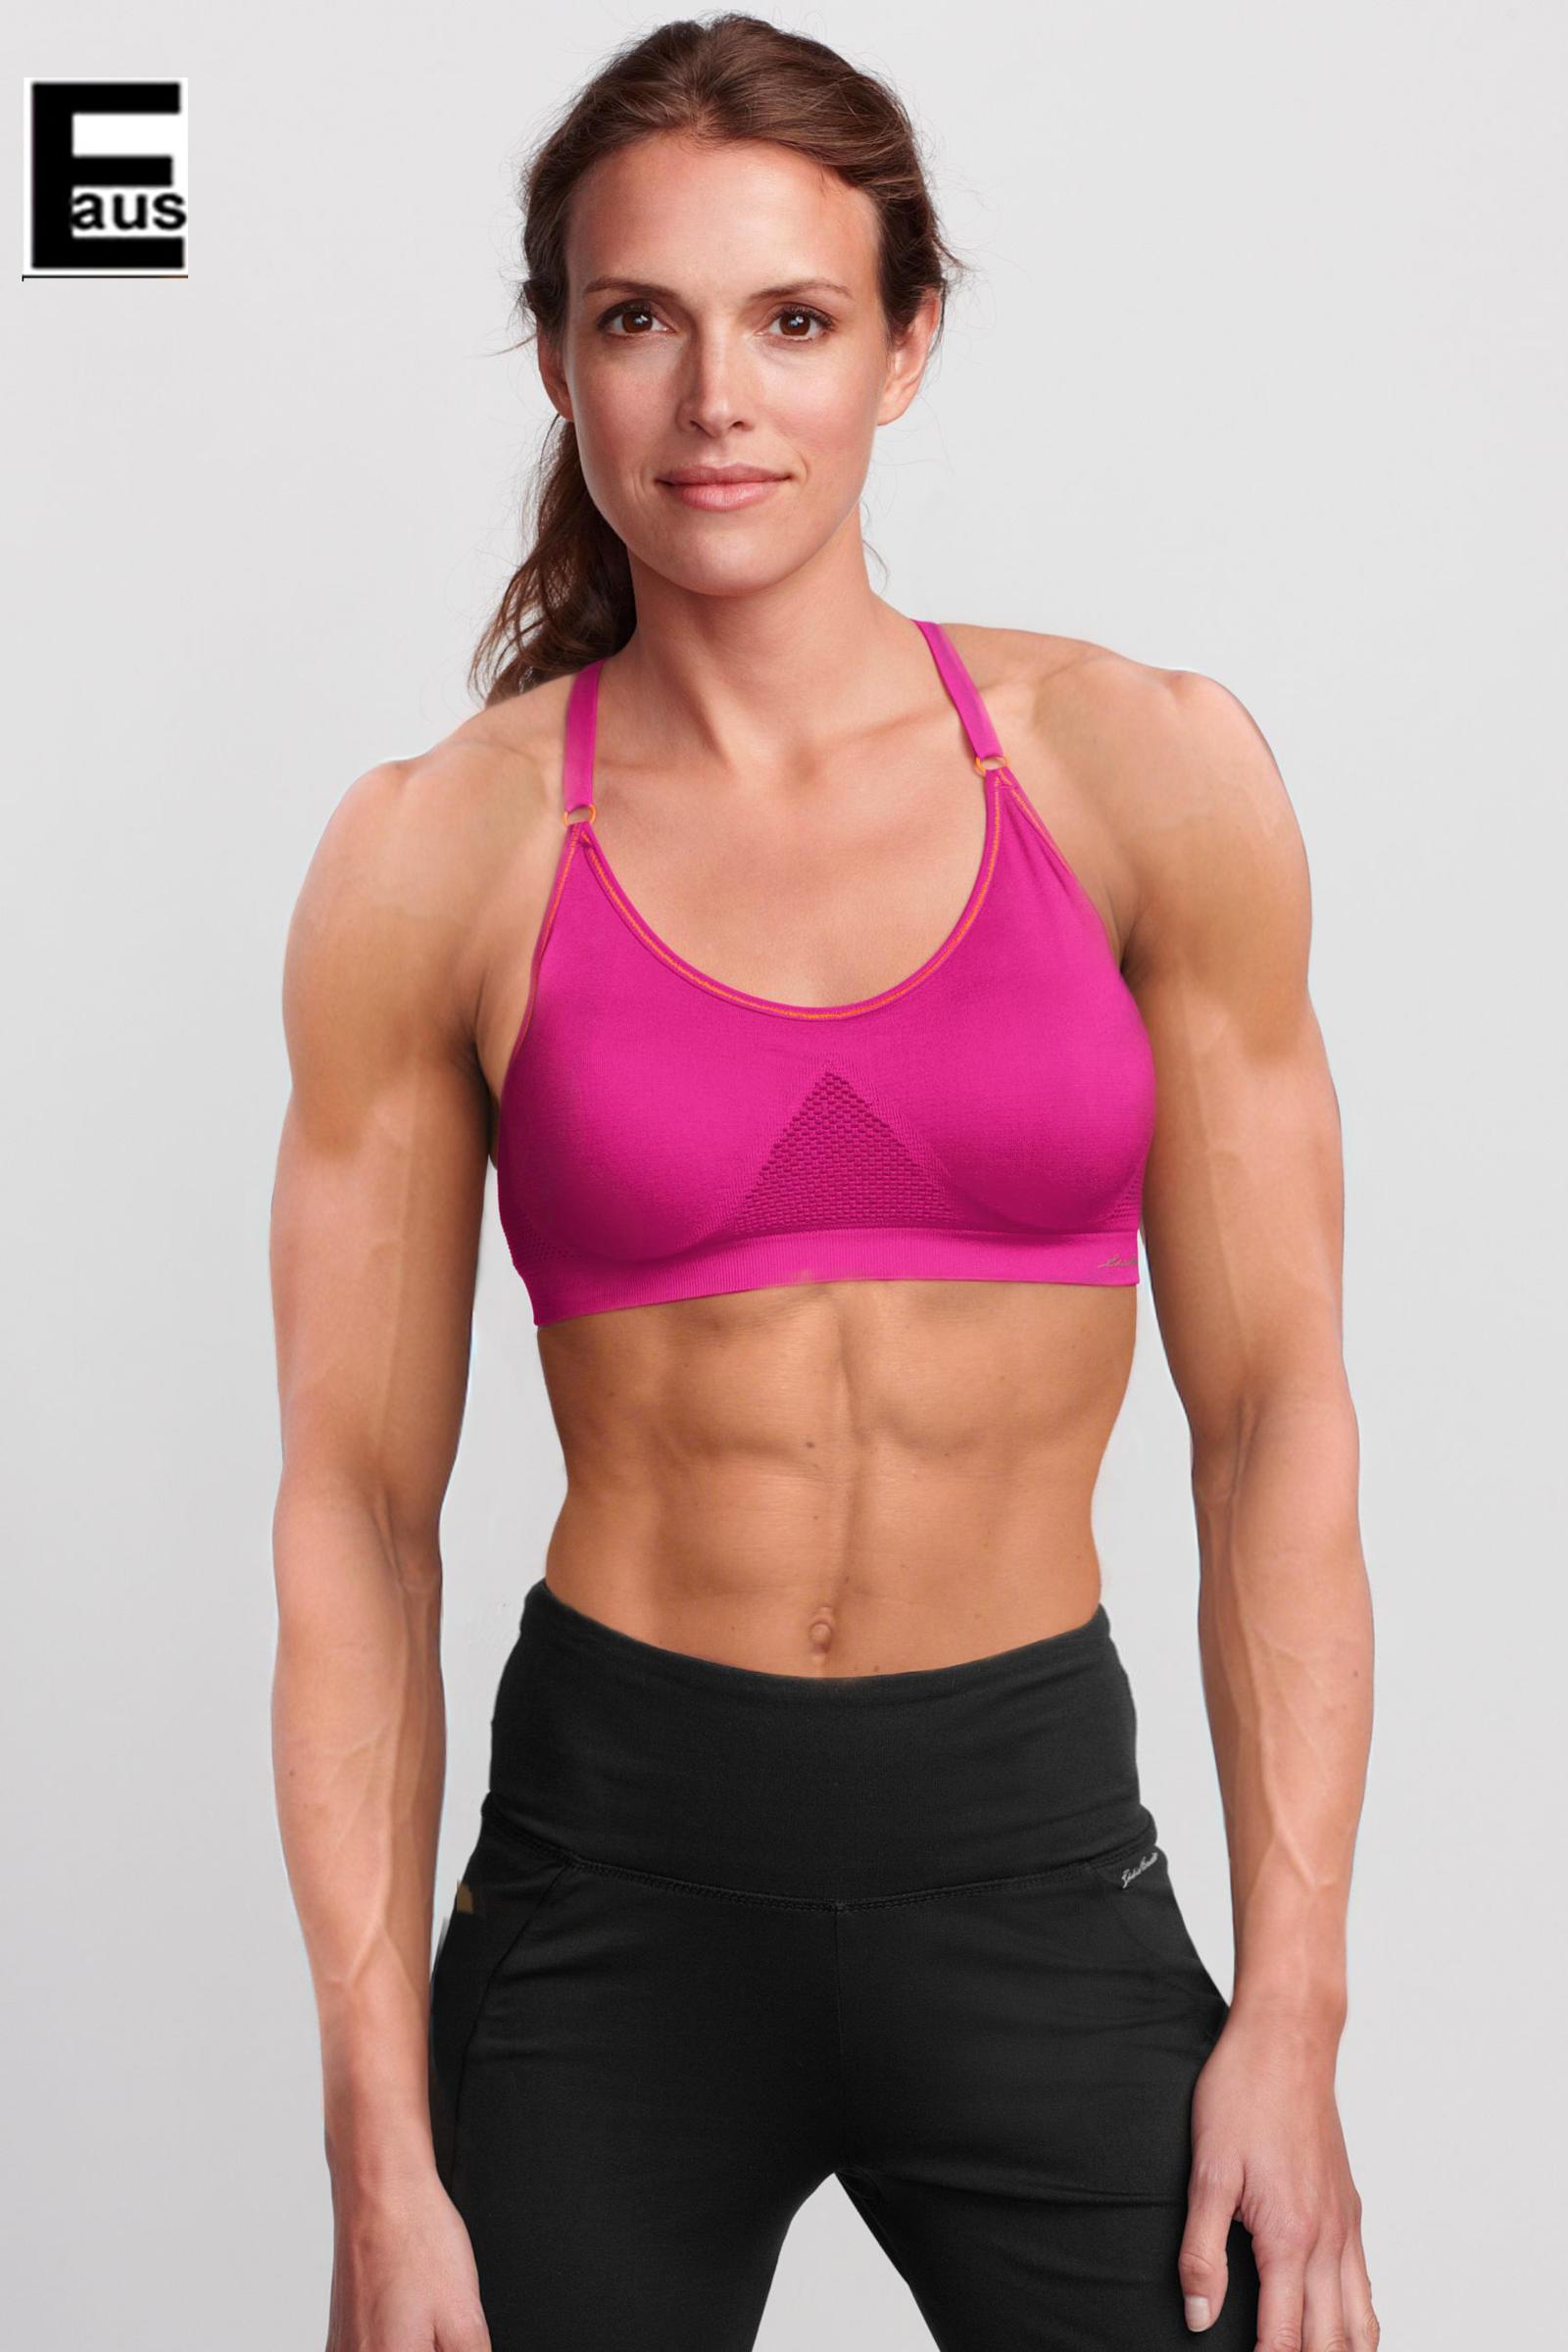 Female Fitness Model 3 by ~ edinaus